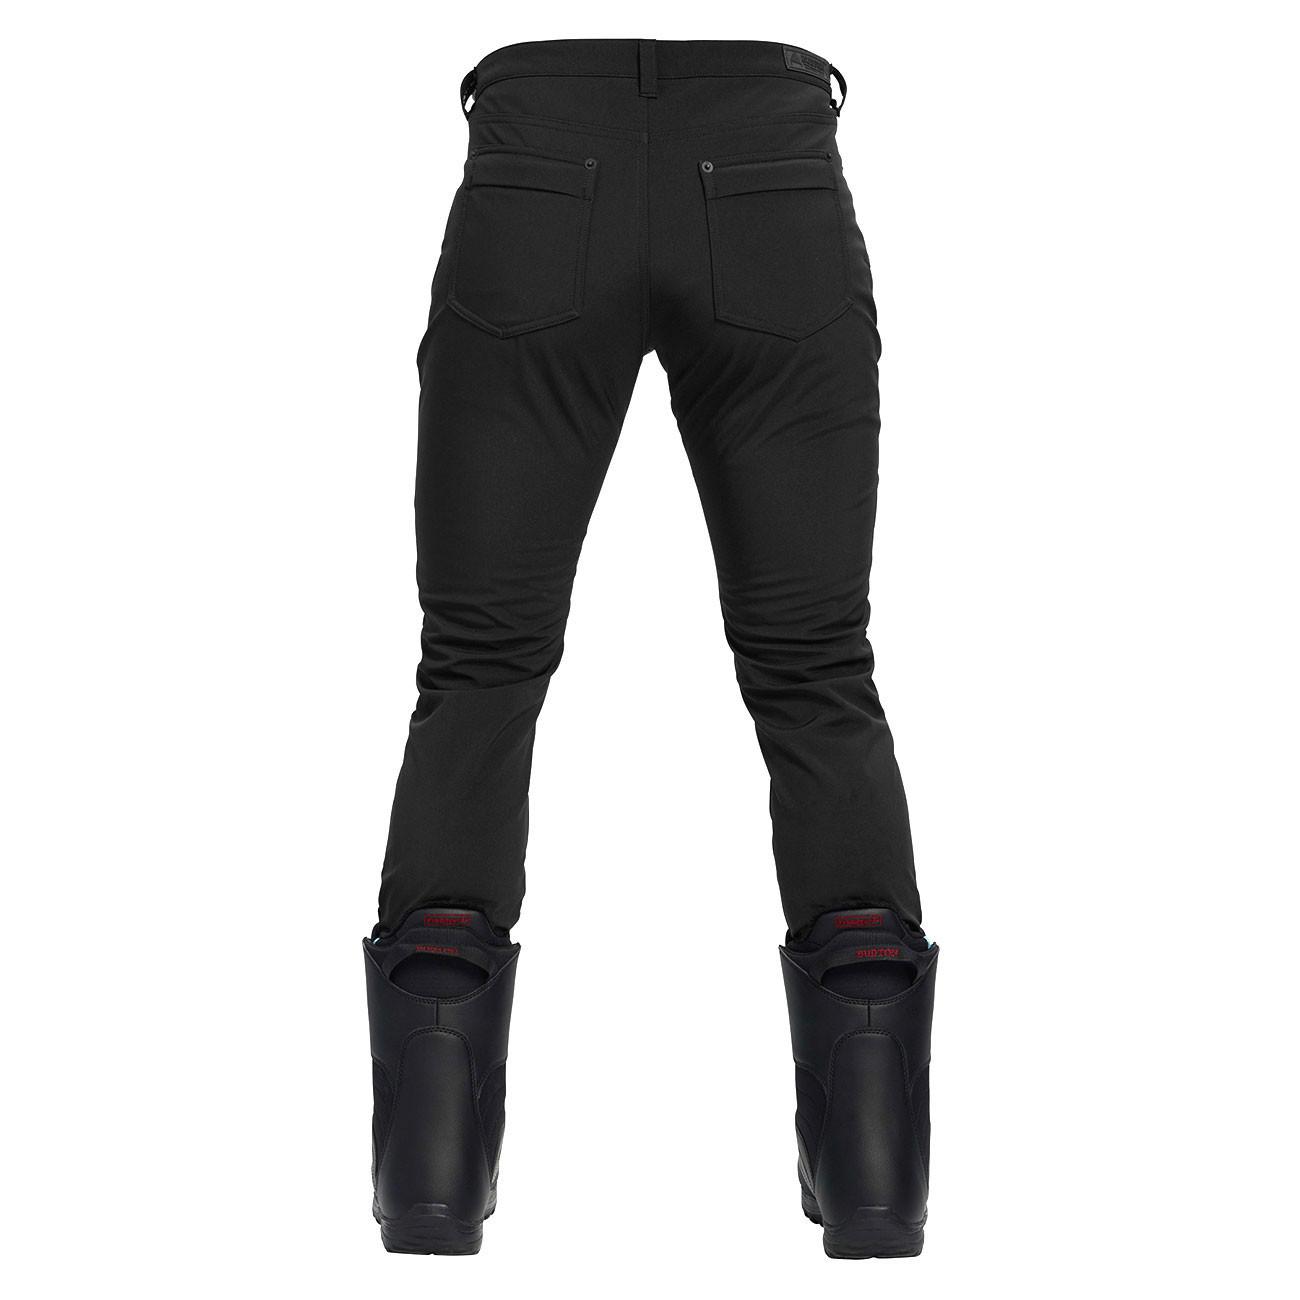 Kalhoty Burton Wms Ivy Under Boot true black  1fe2e60383